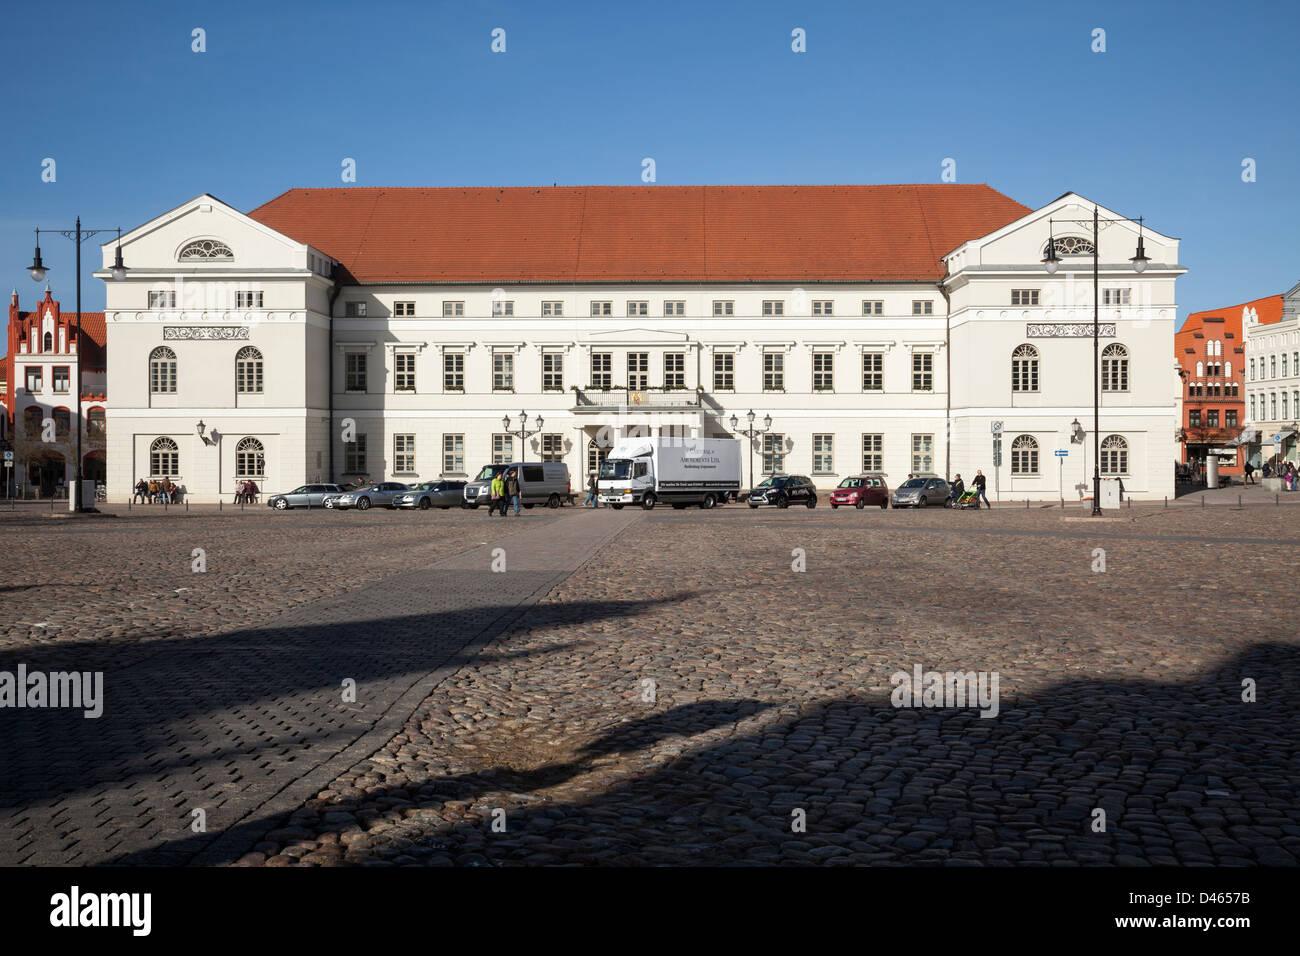 Rathaus, Wismar, Mecklenburg Vorpommern, Germany - Stock Image